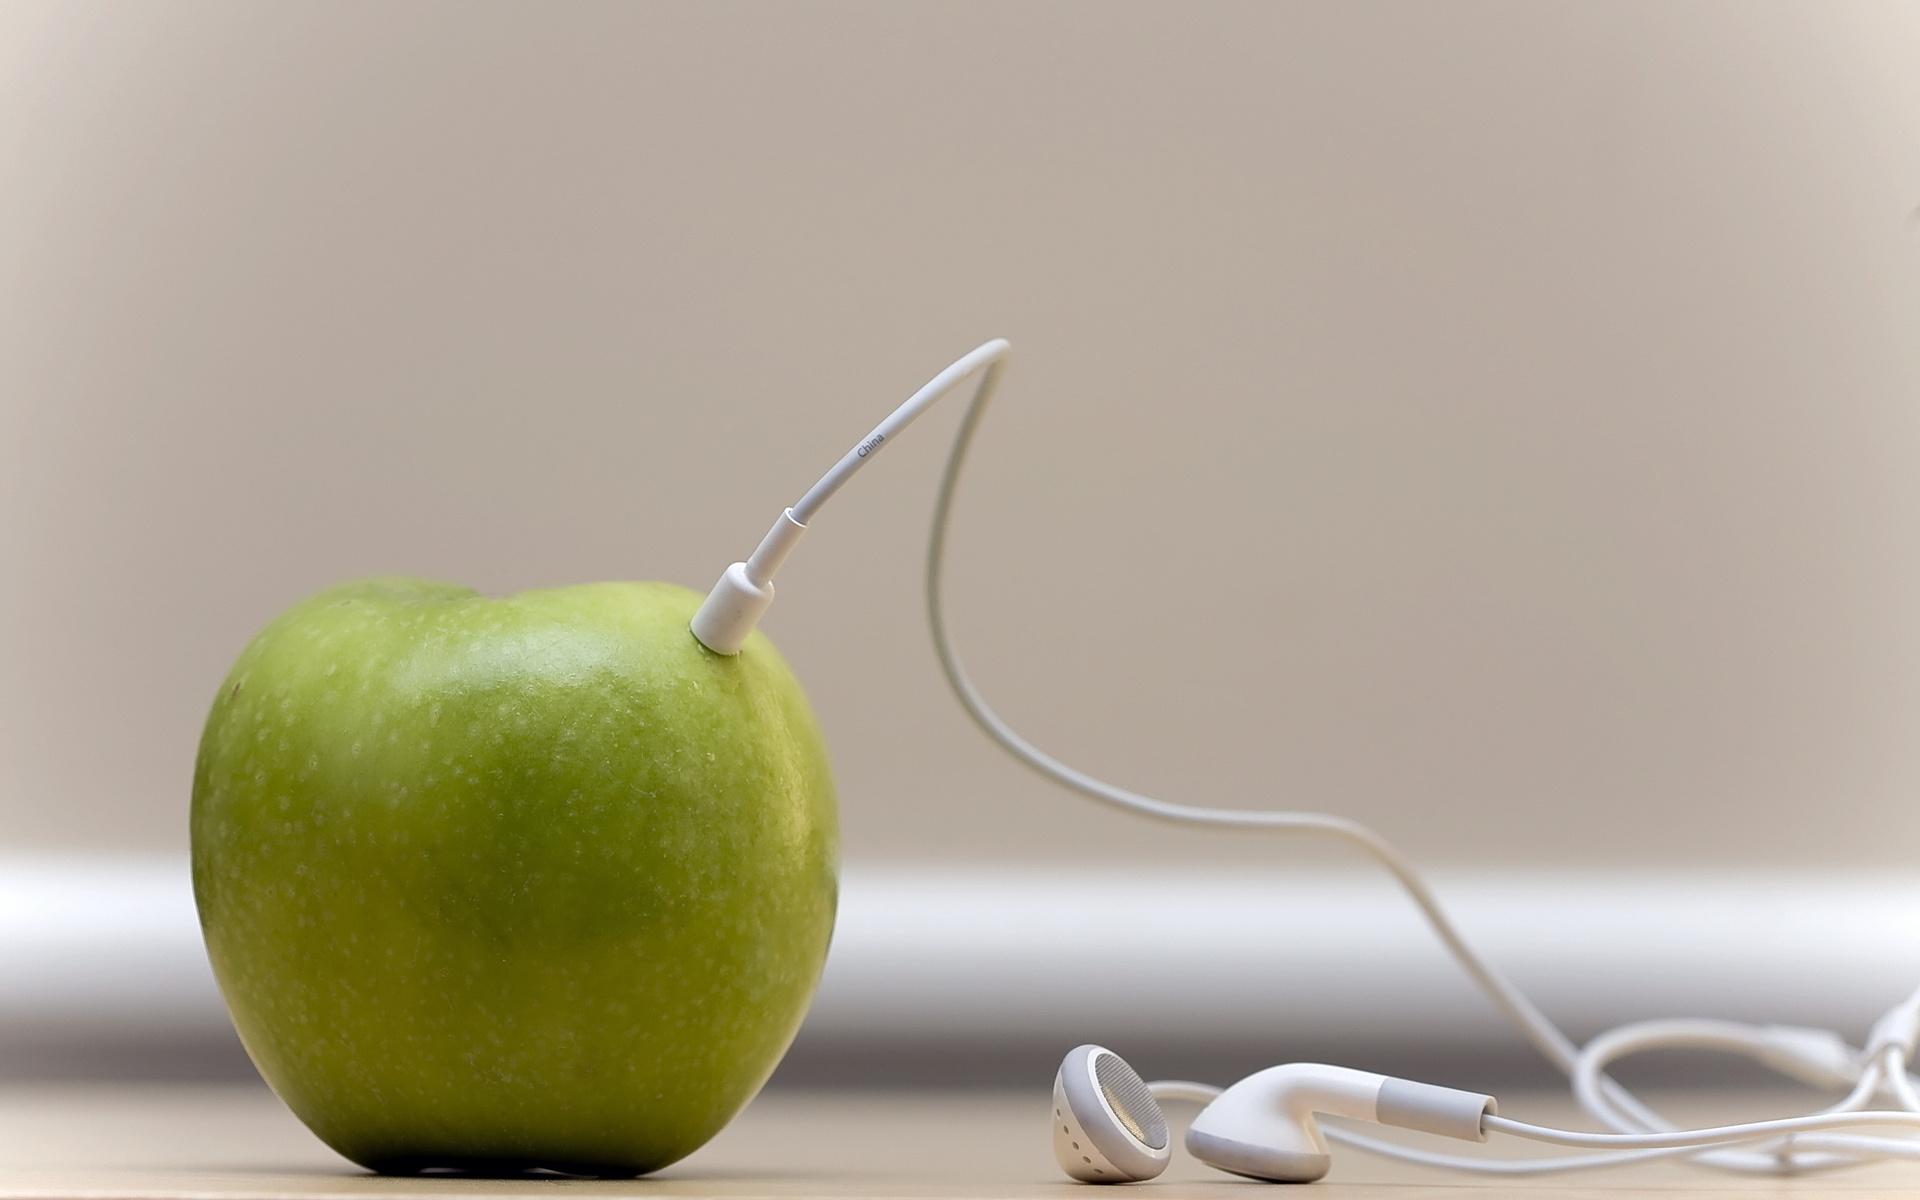 креативные картинки яблок атронахи представляют собой